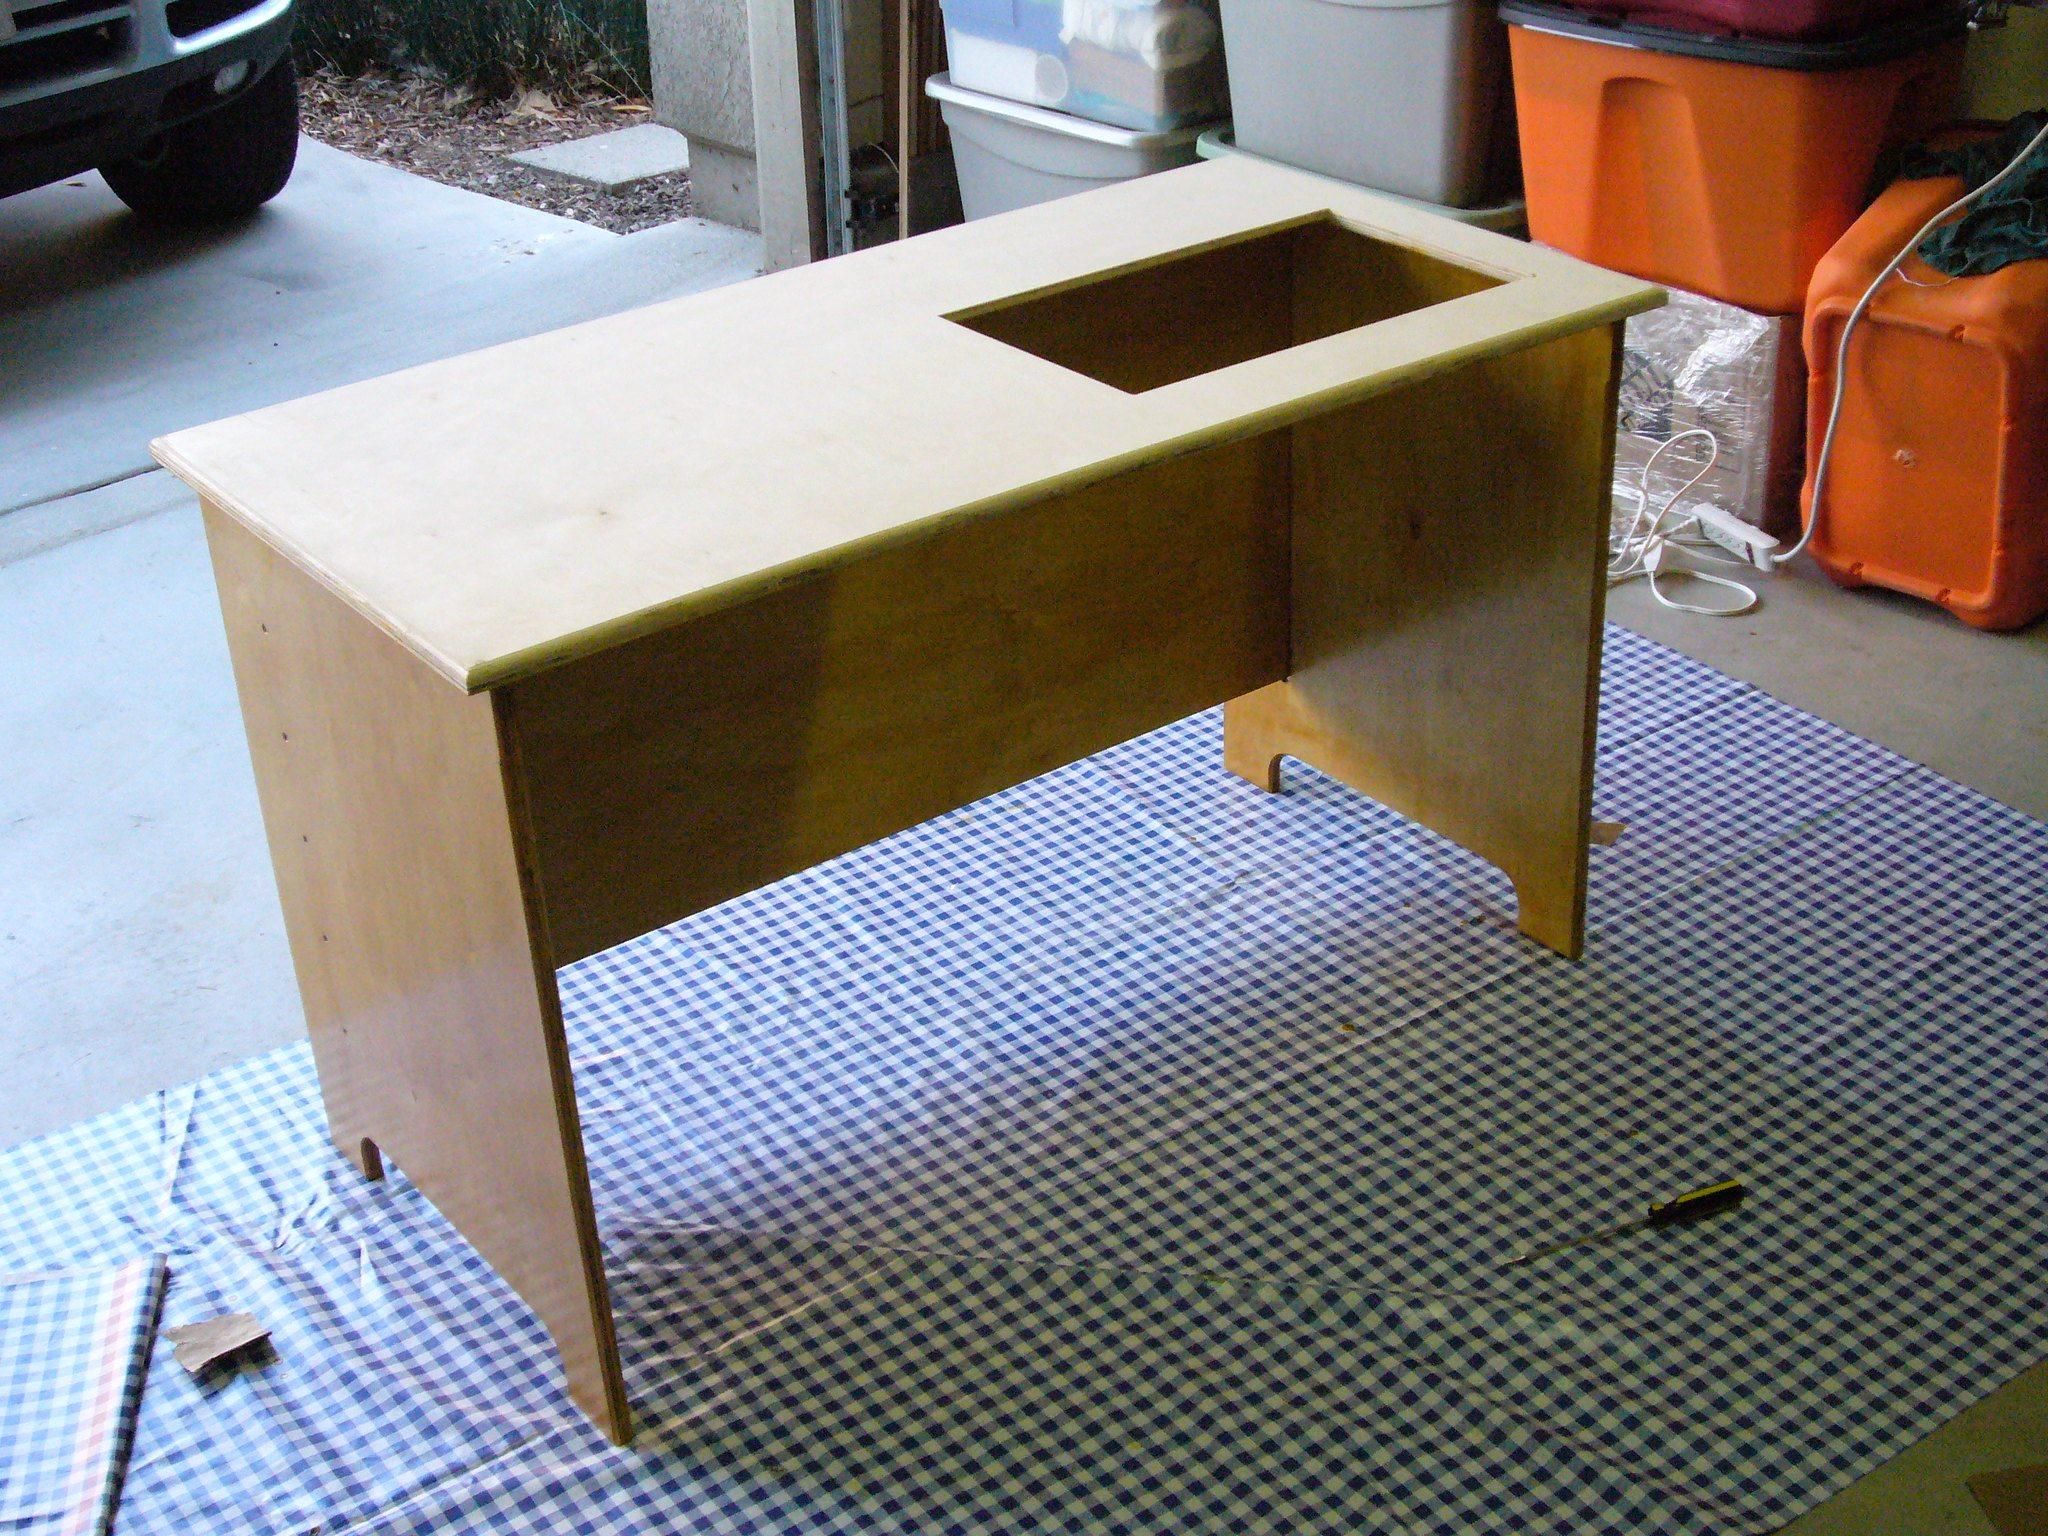 diy, sewing table